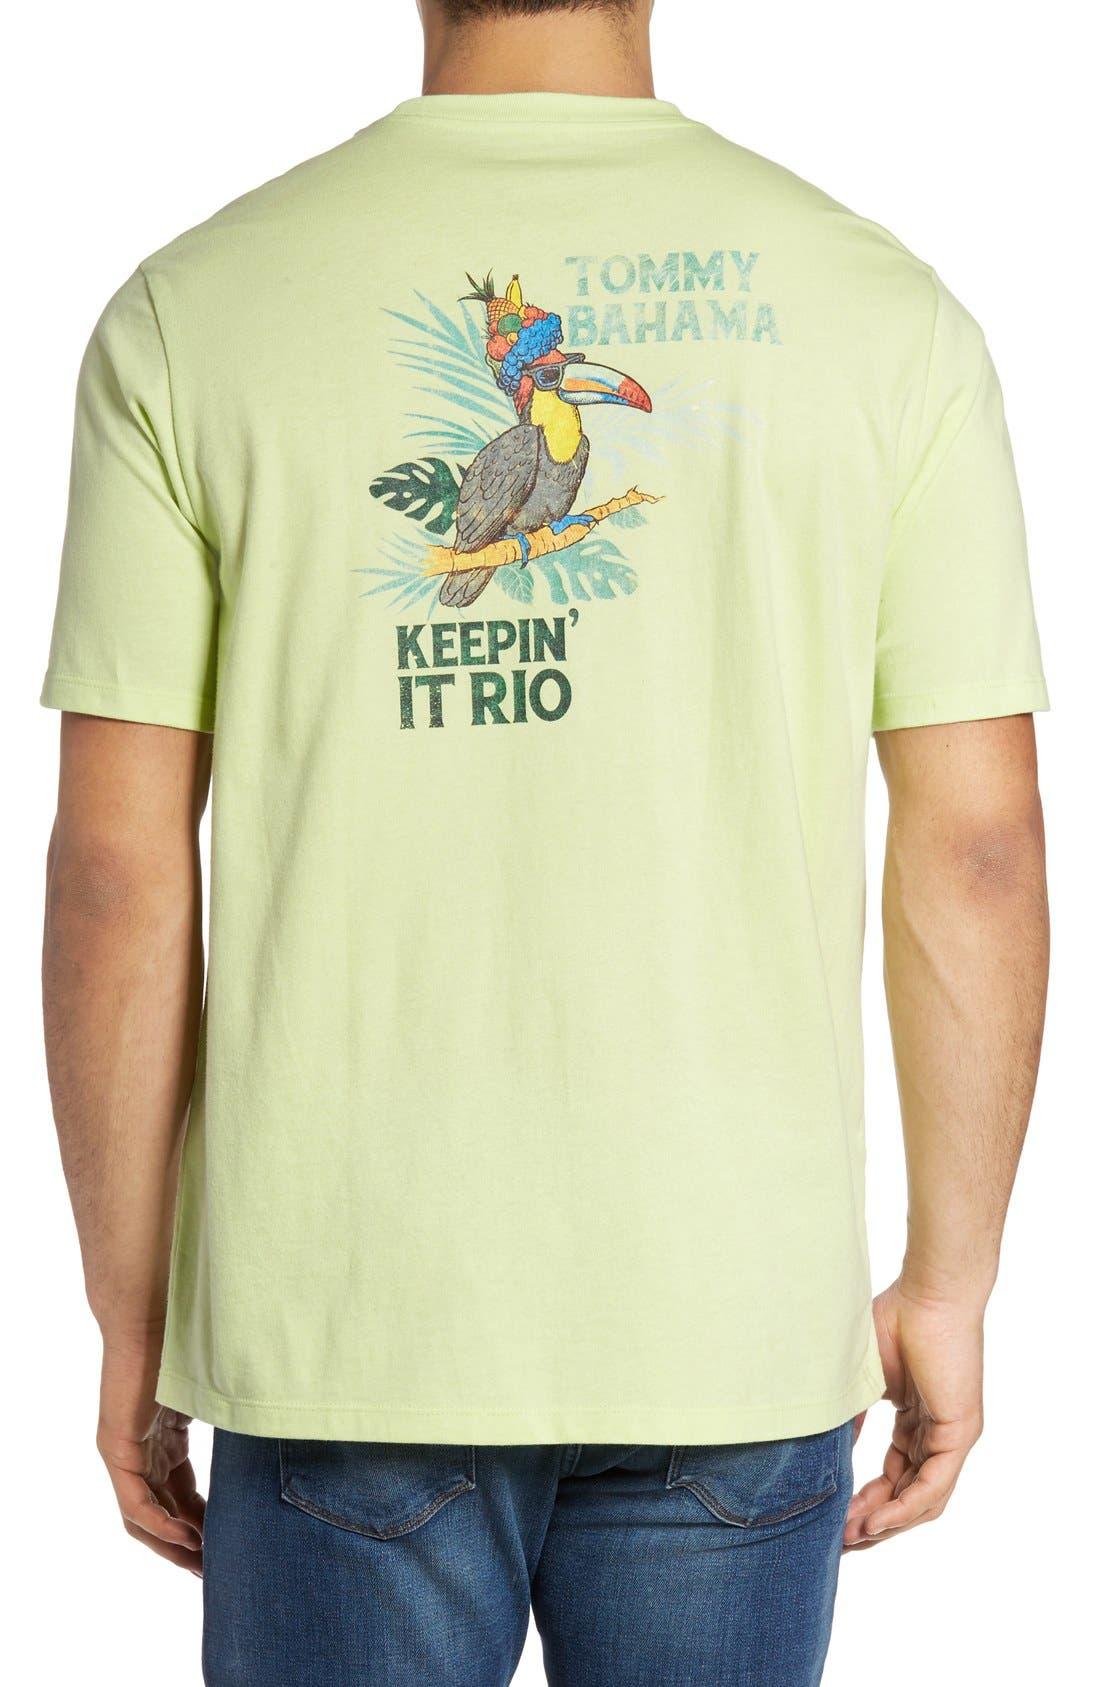 Main Image - Tommy Bahama Keeping It Rio Graphic T-Shirt (Big & Tall)